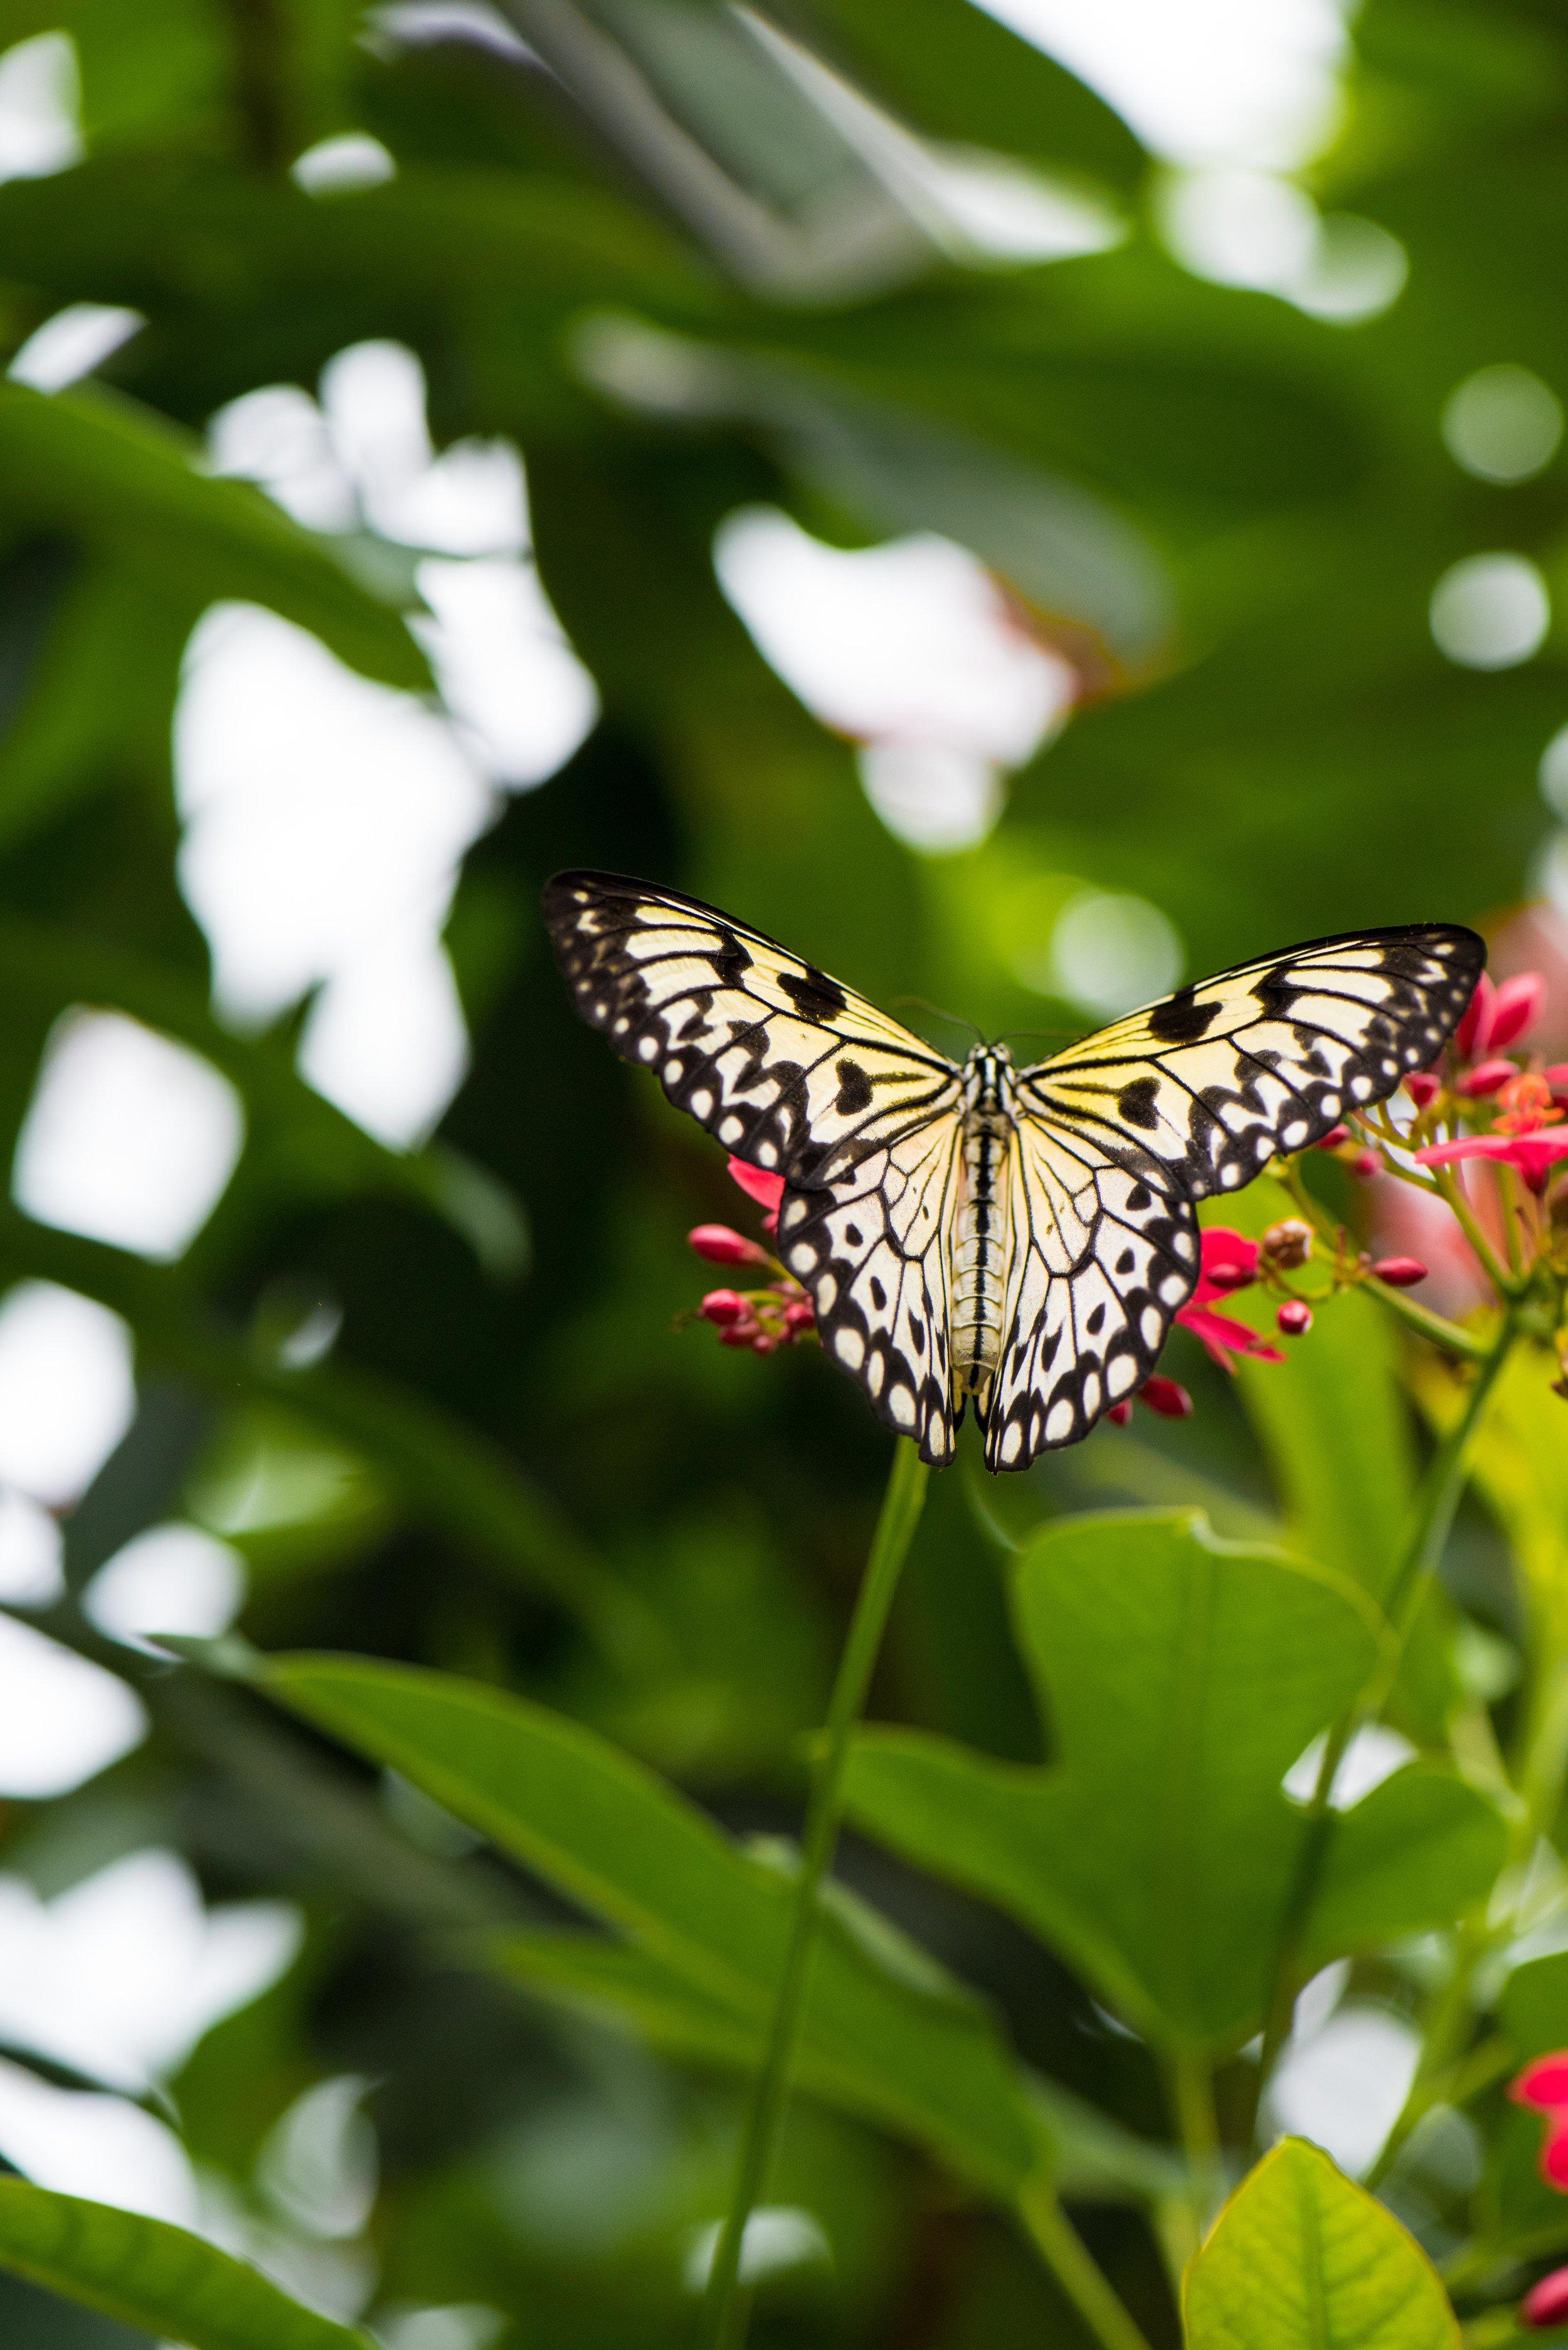 calgary zoo-3724.jpg